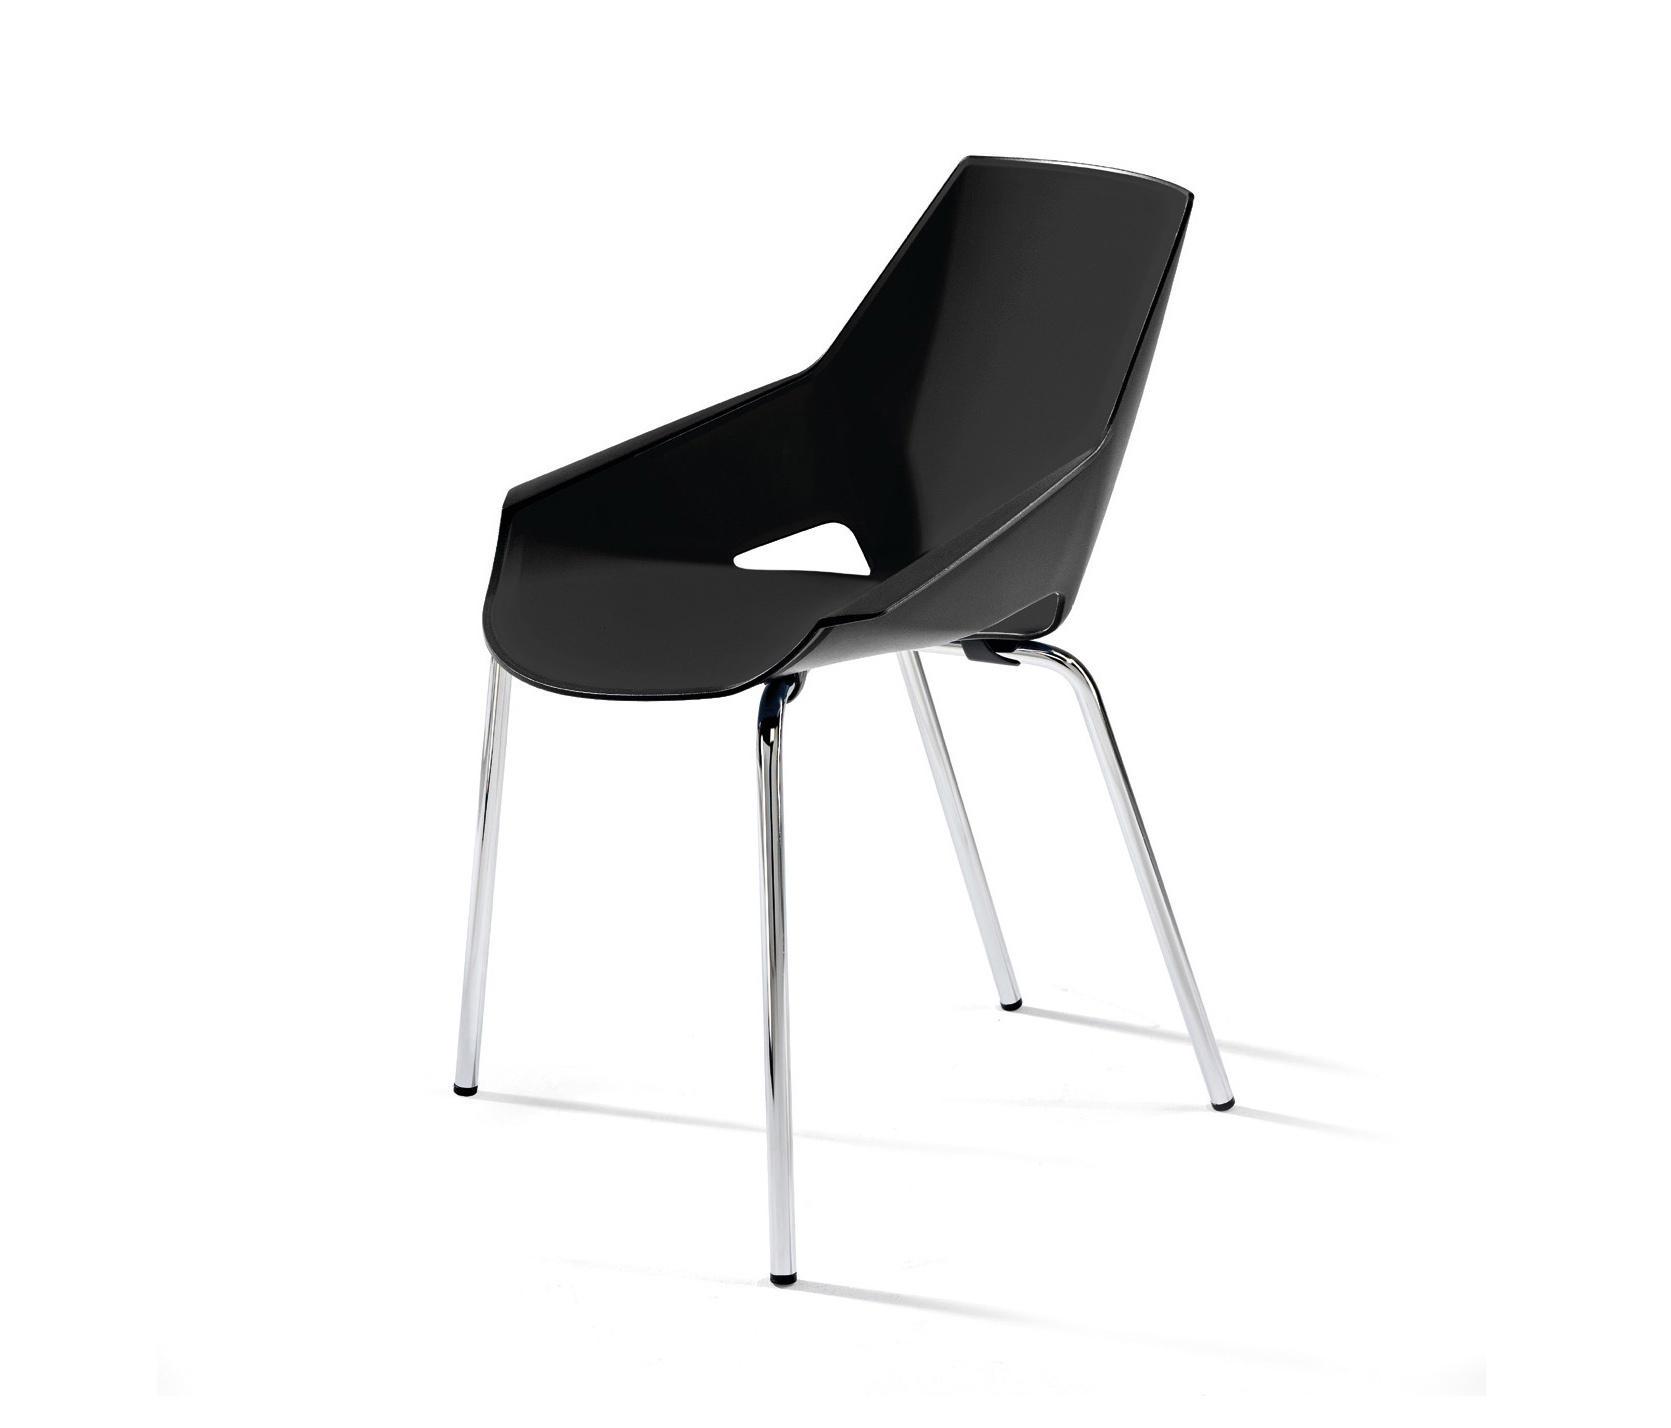 viva chaise